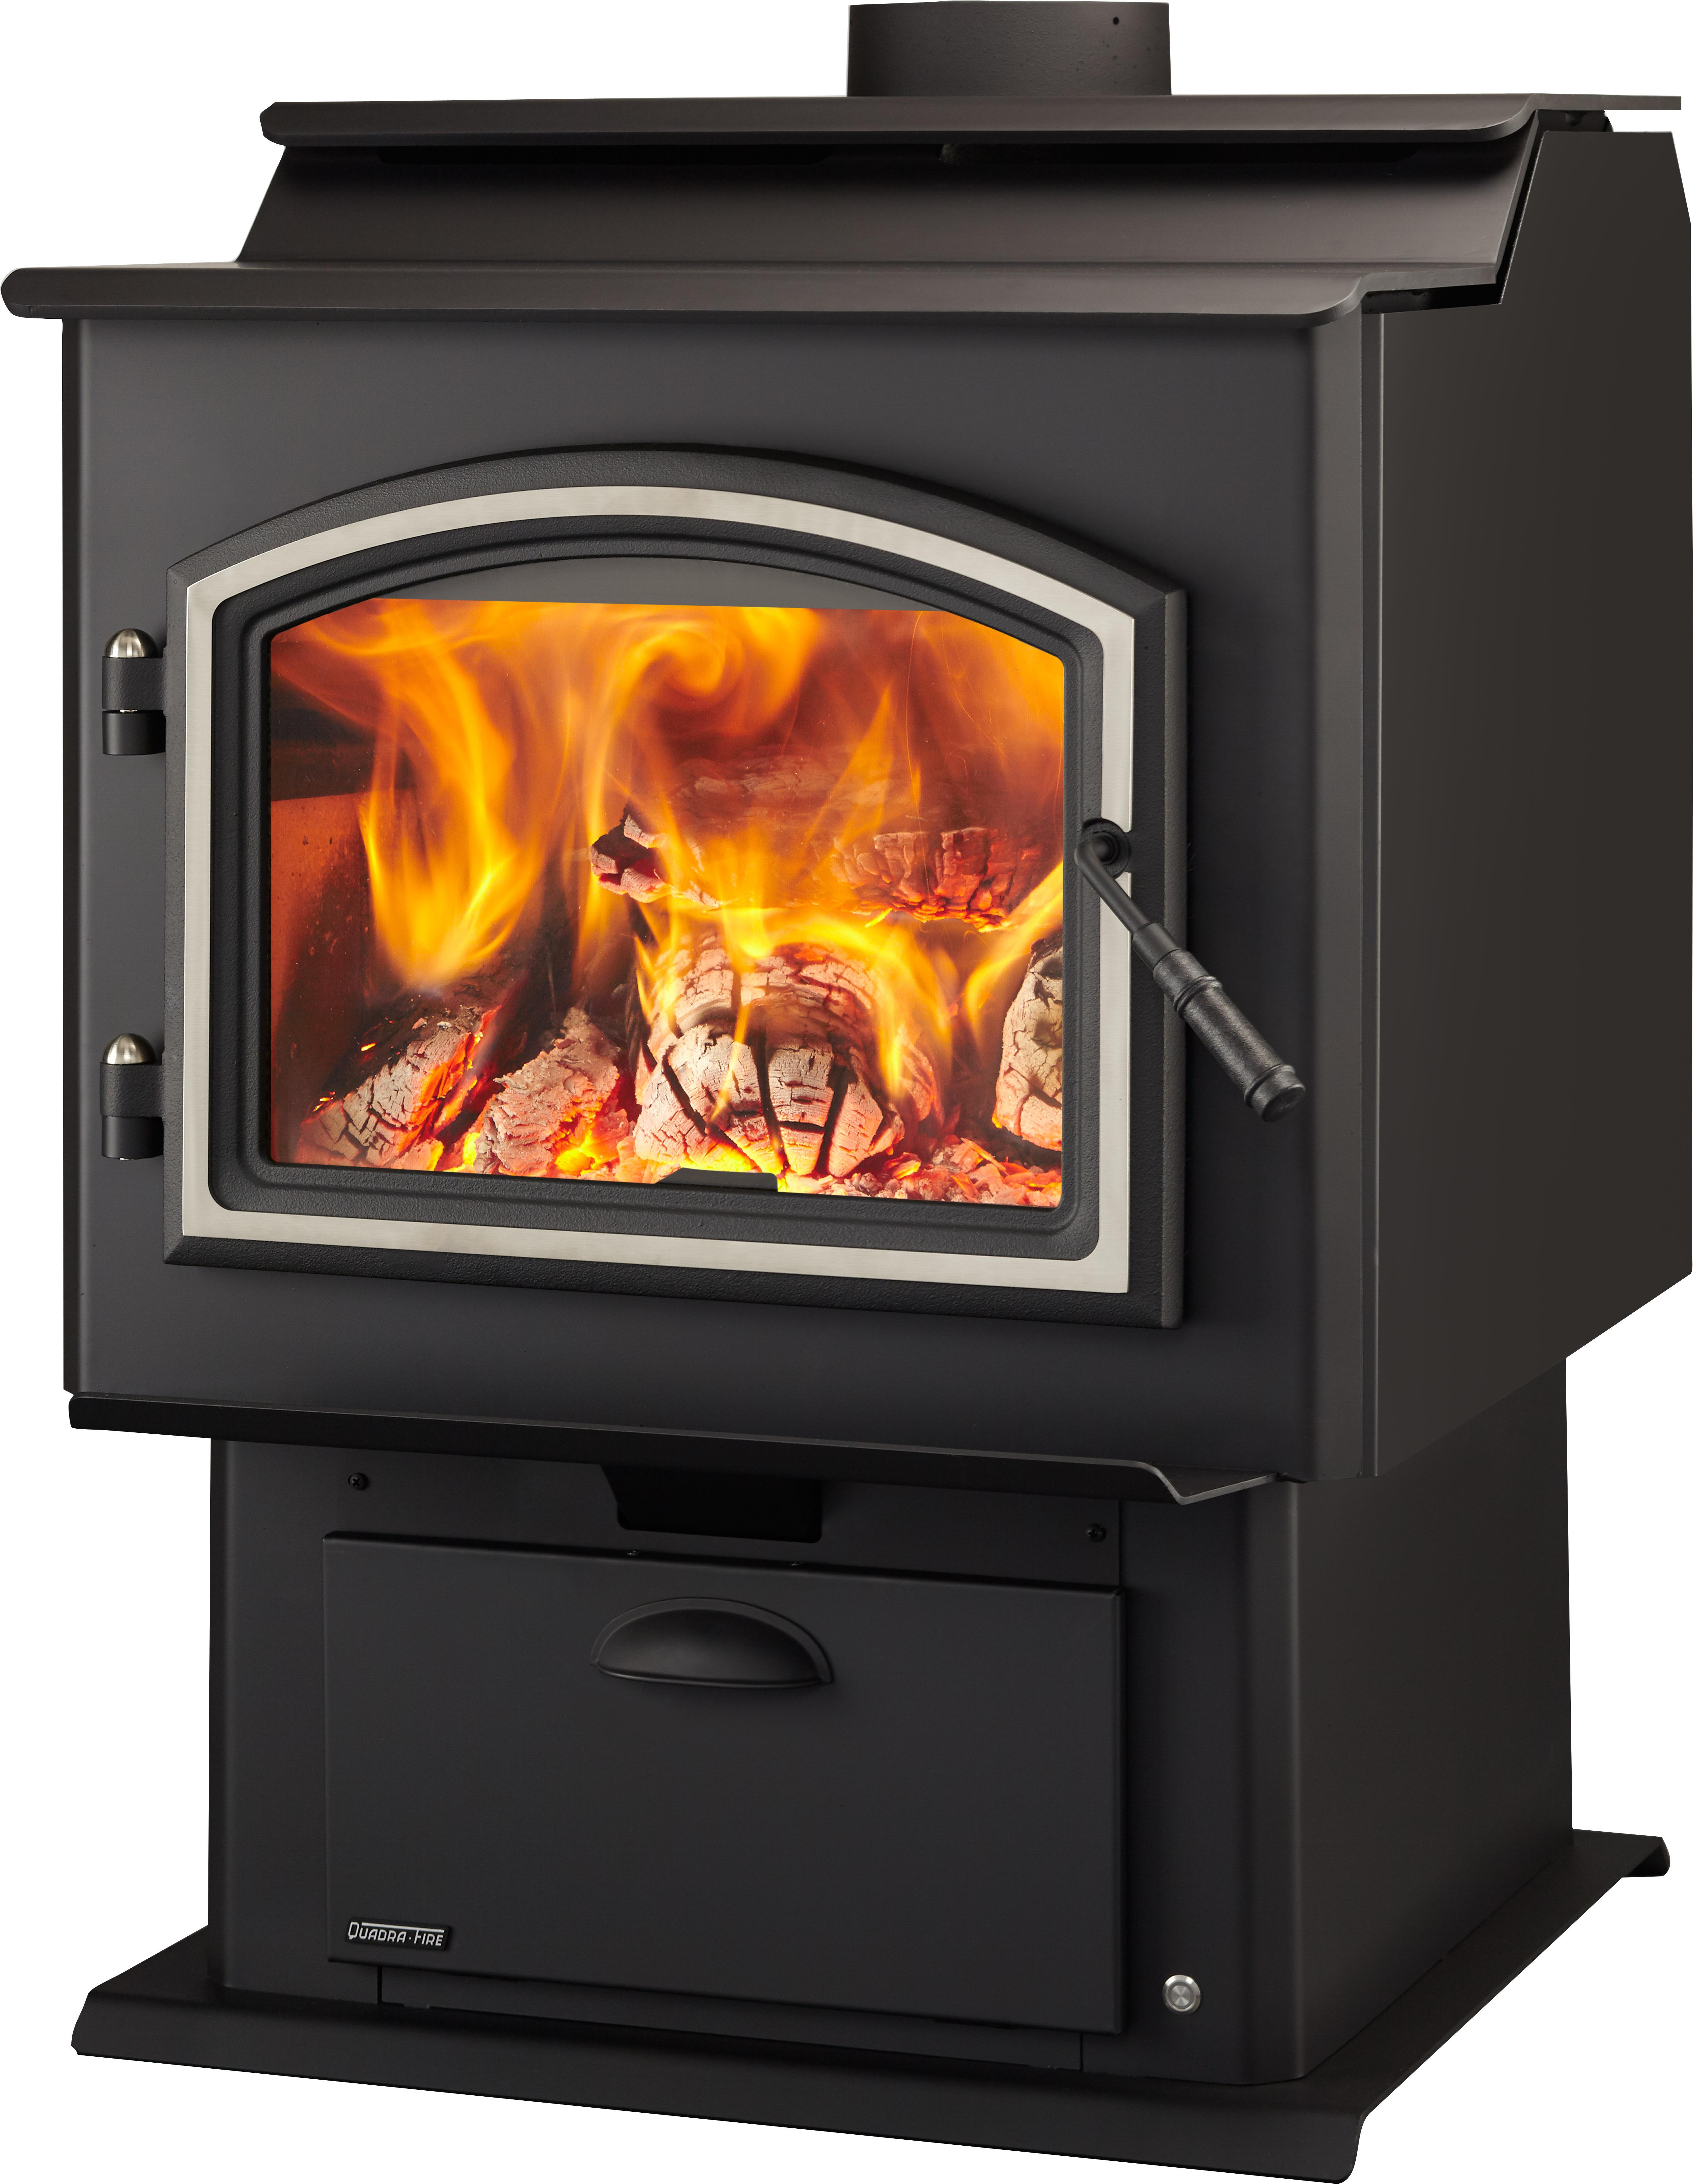 Quadra Fire Adventure Ii Wood Stove H2oasis